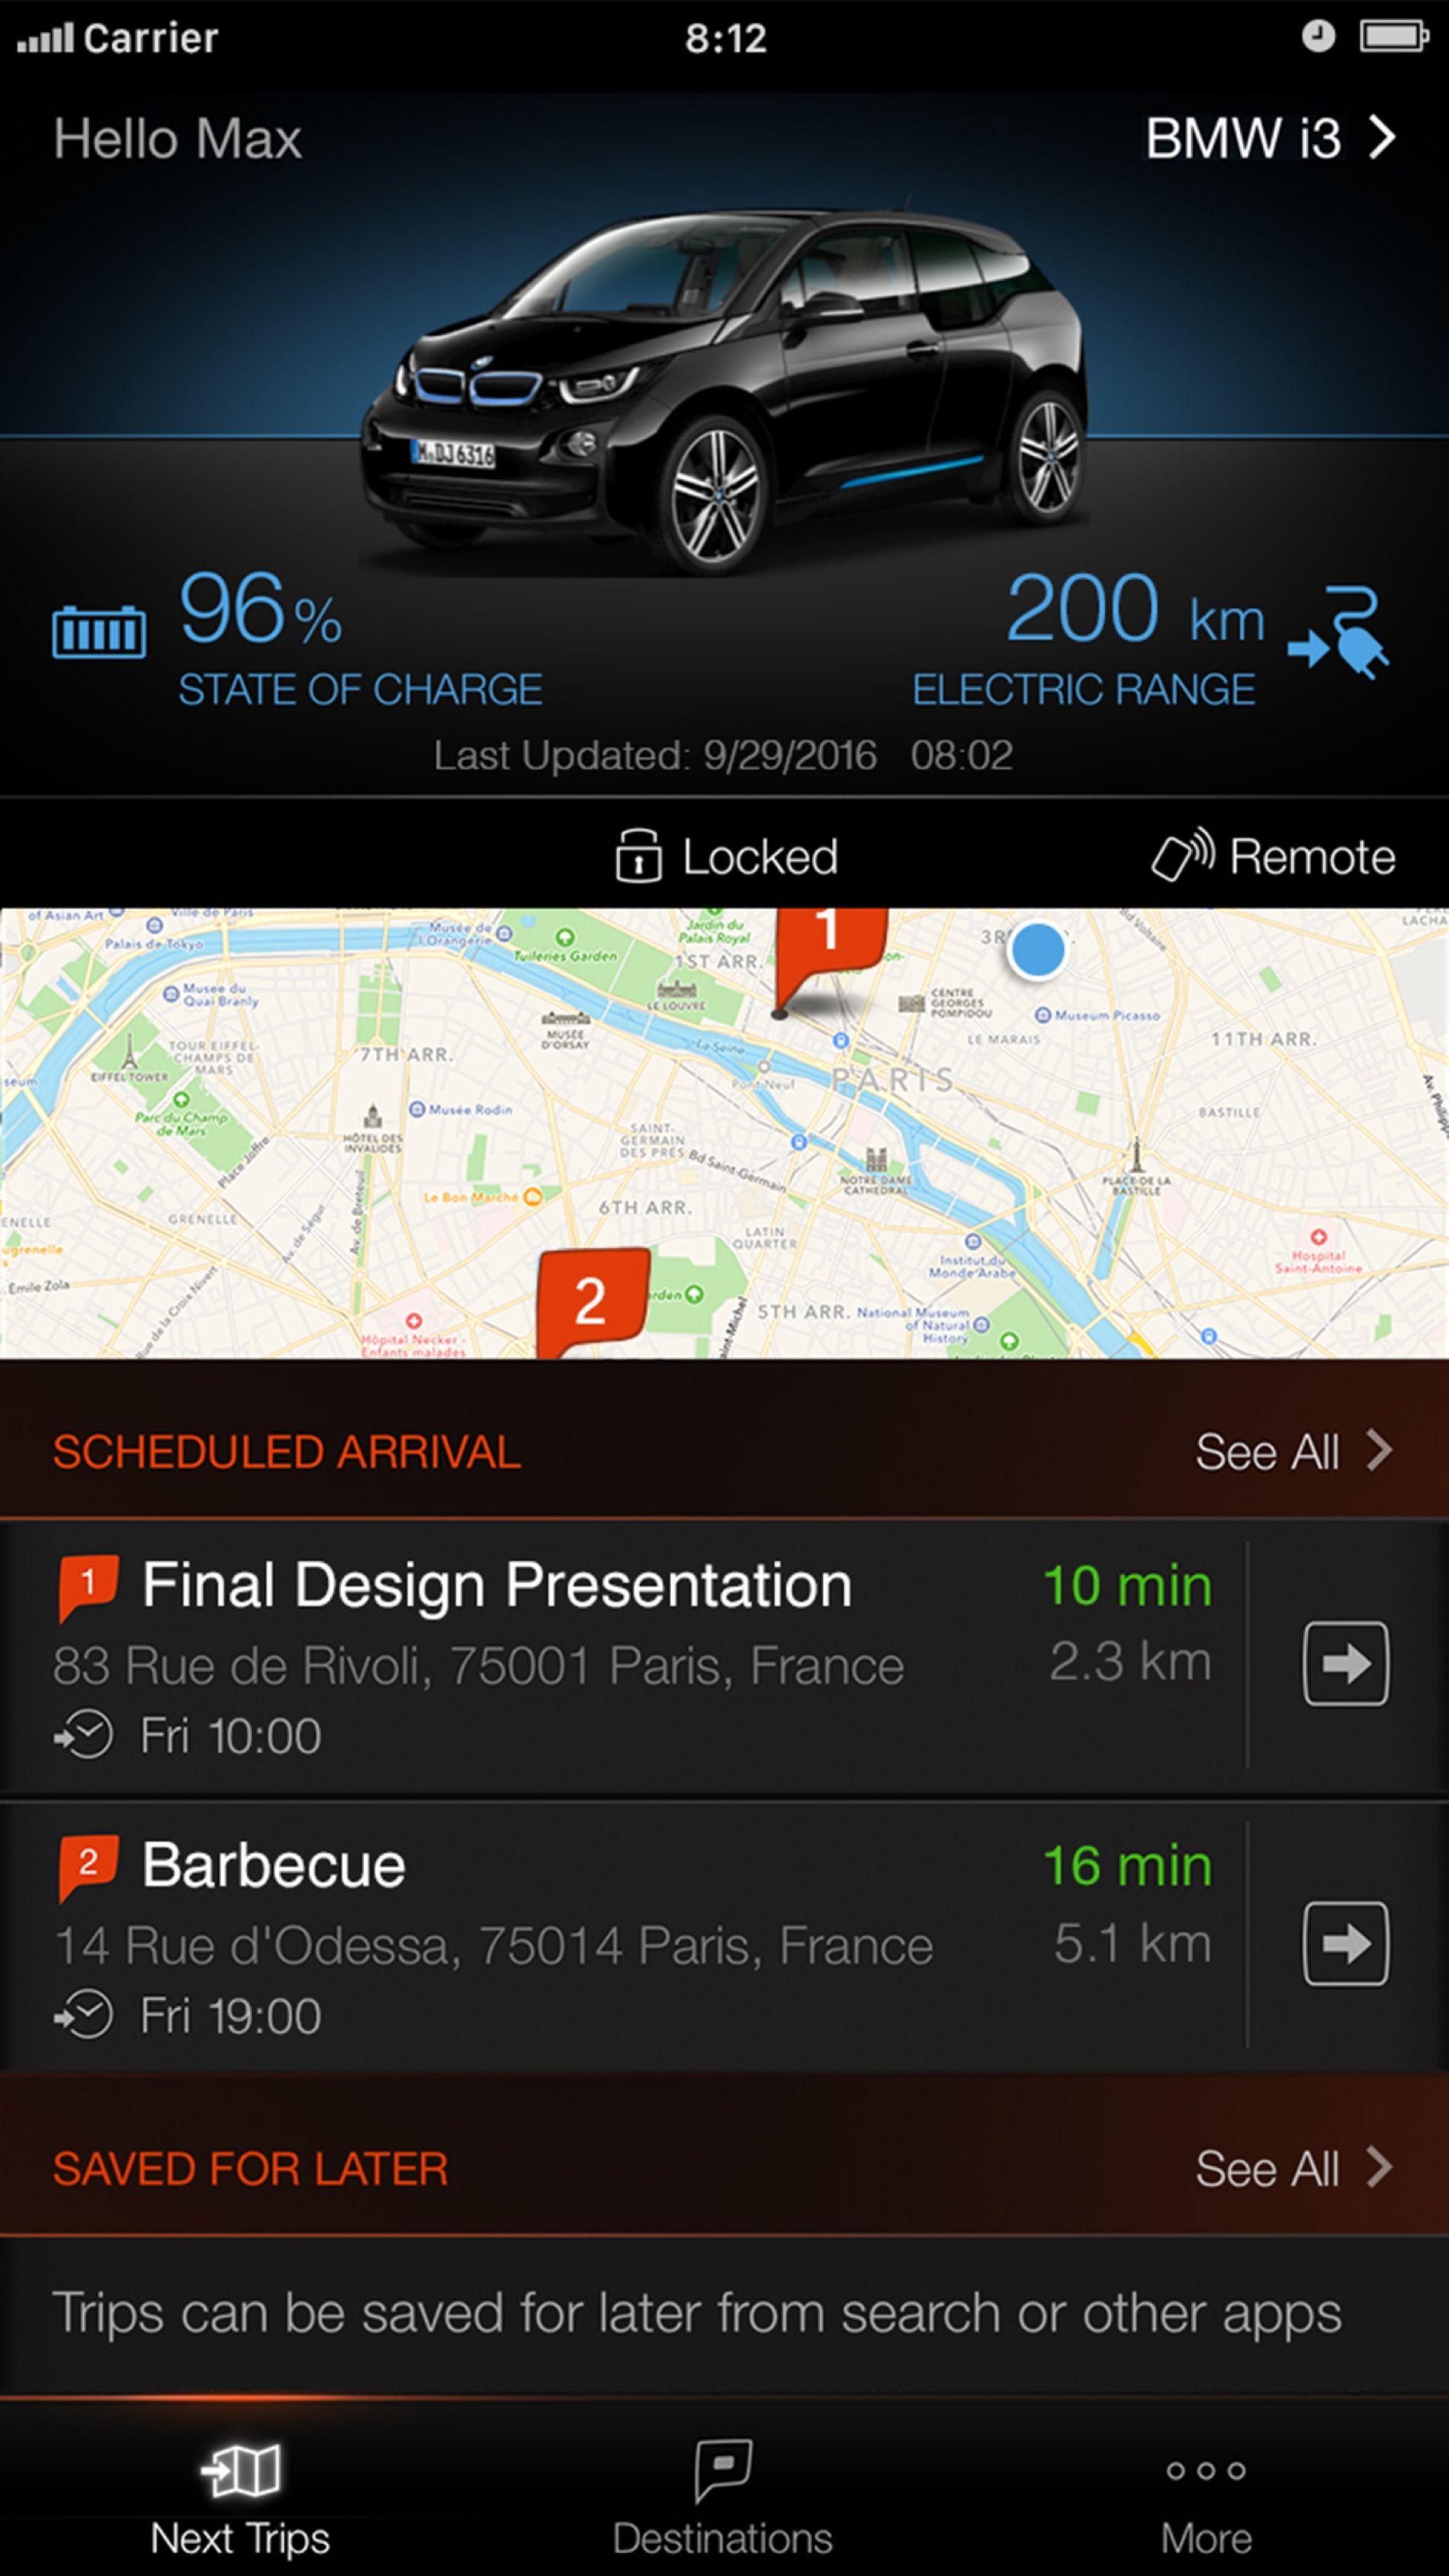 Pin by BMWBLOG com on BMW | Apple watch apps, New bmw, BMW